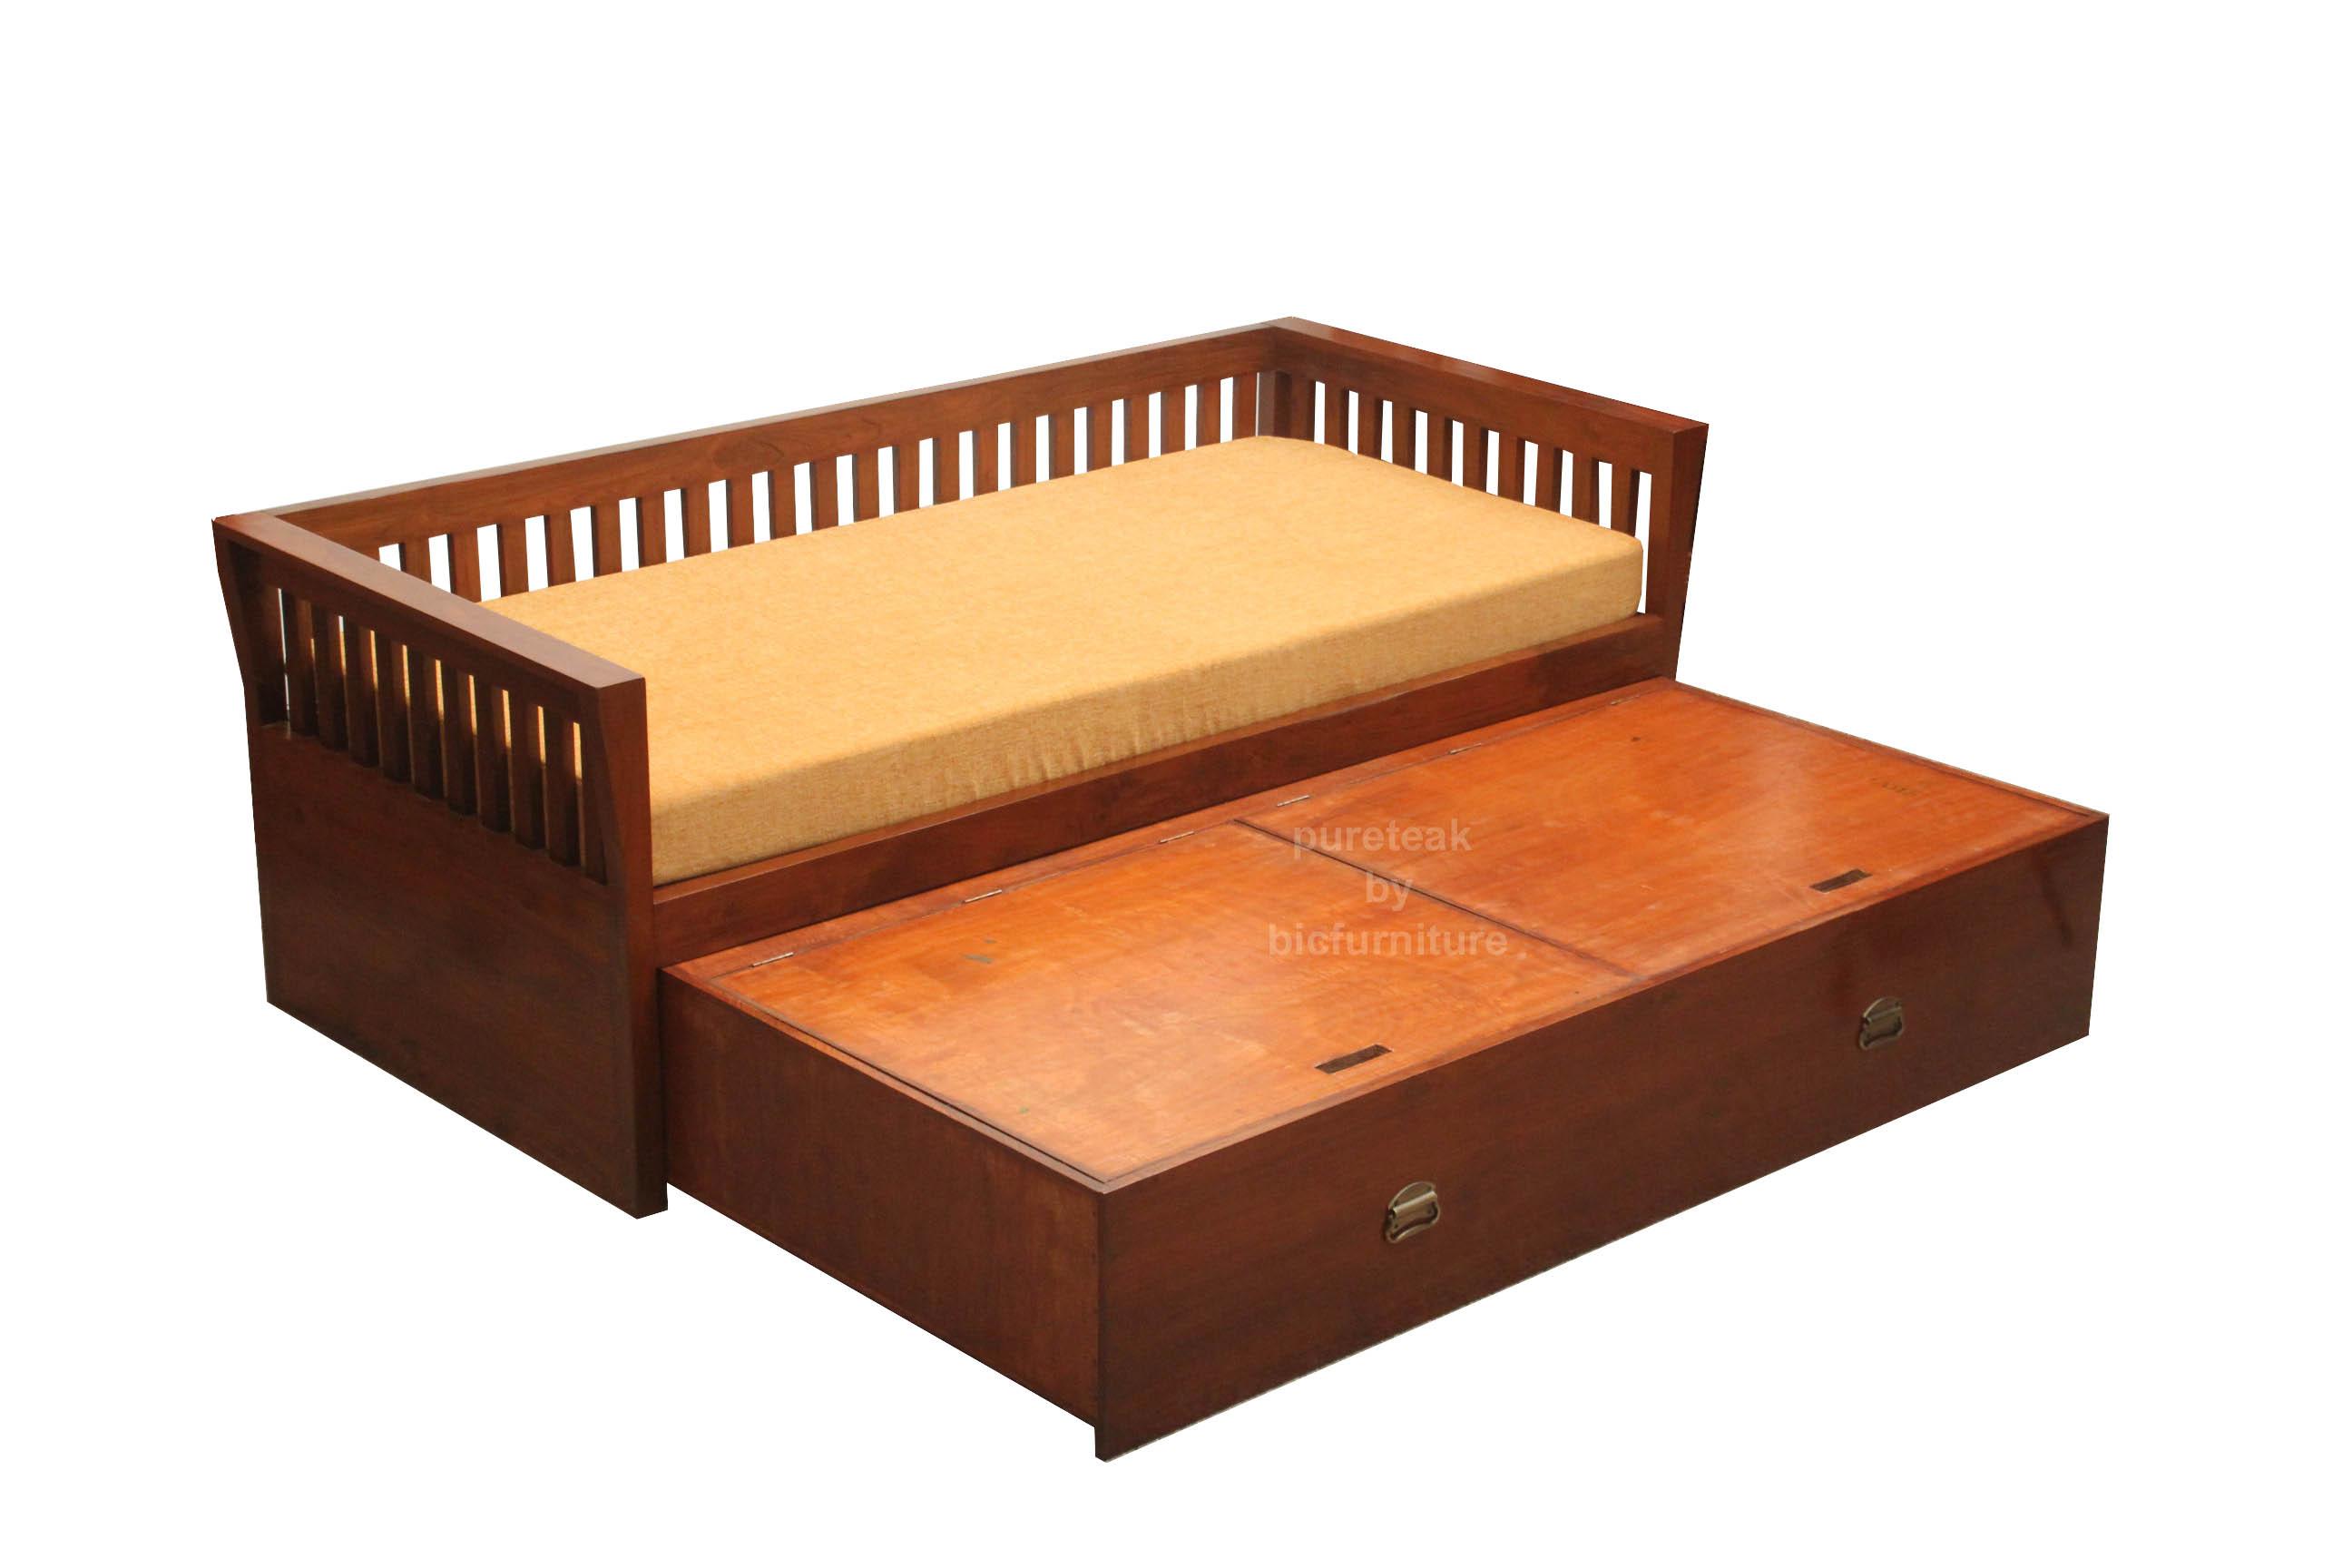 Storage sofa bed & day bed in teak wood